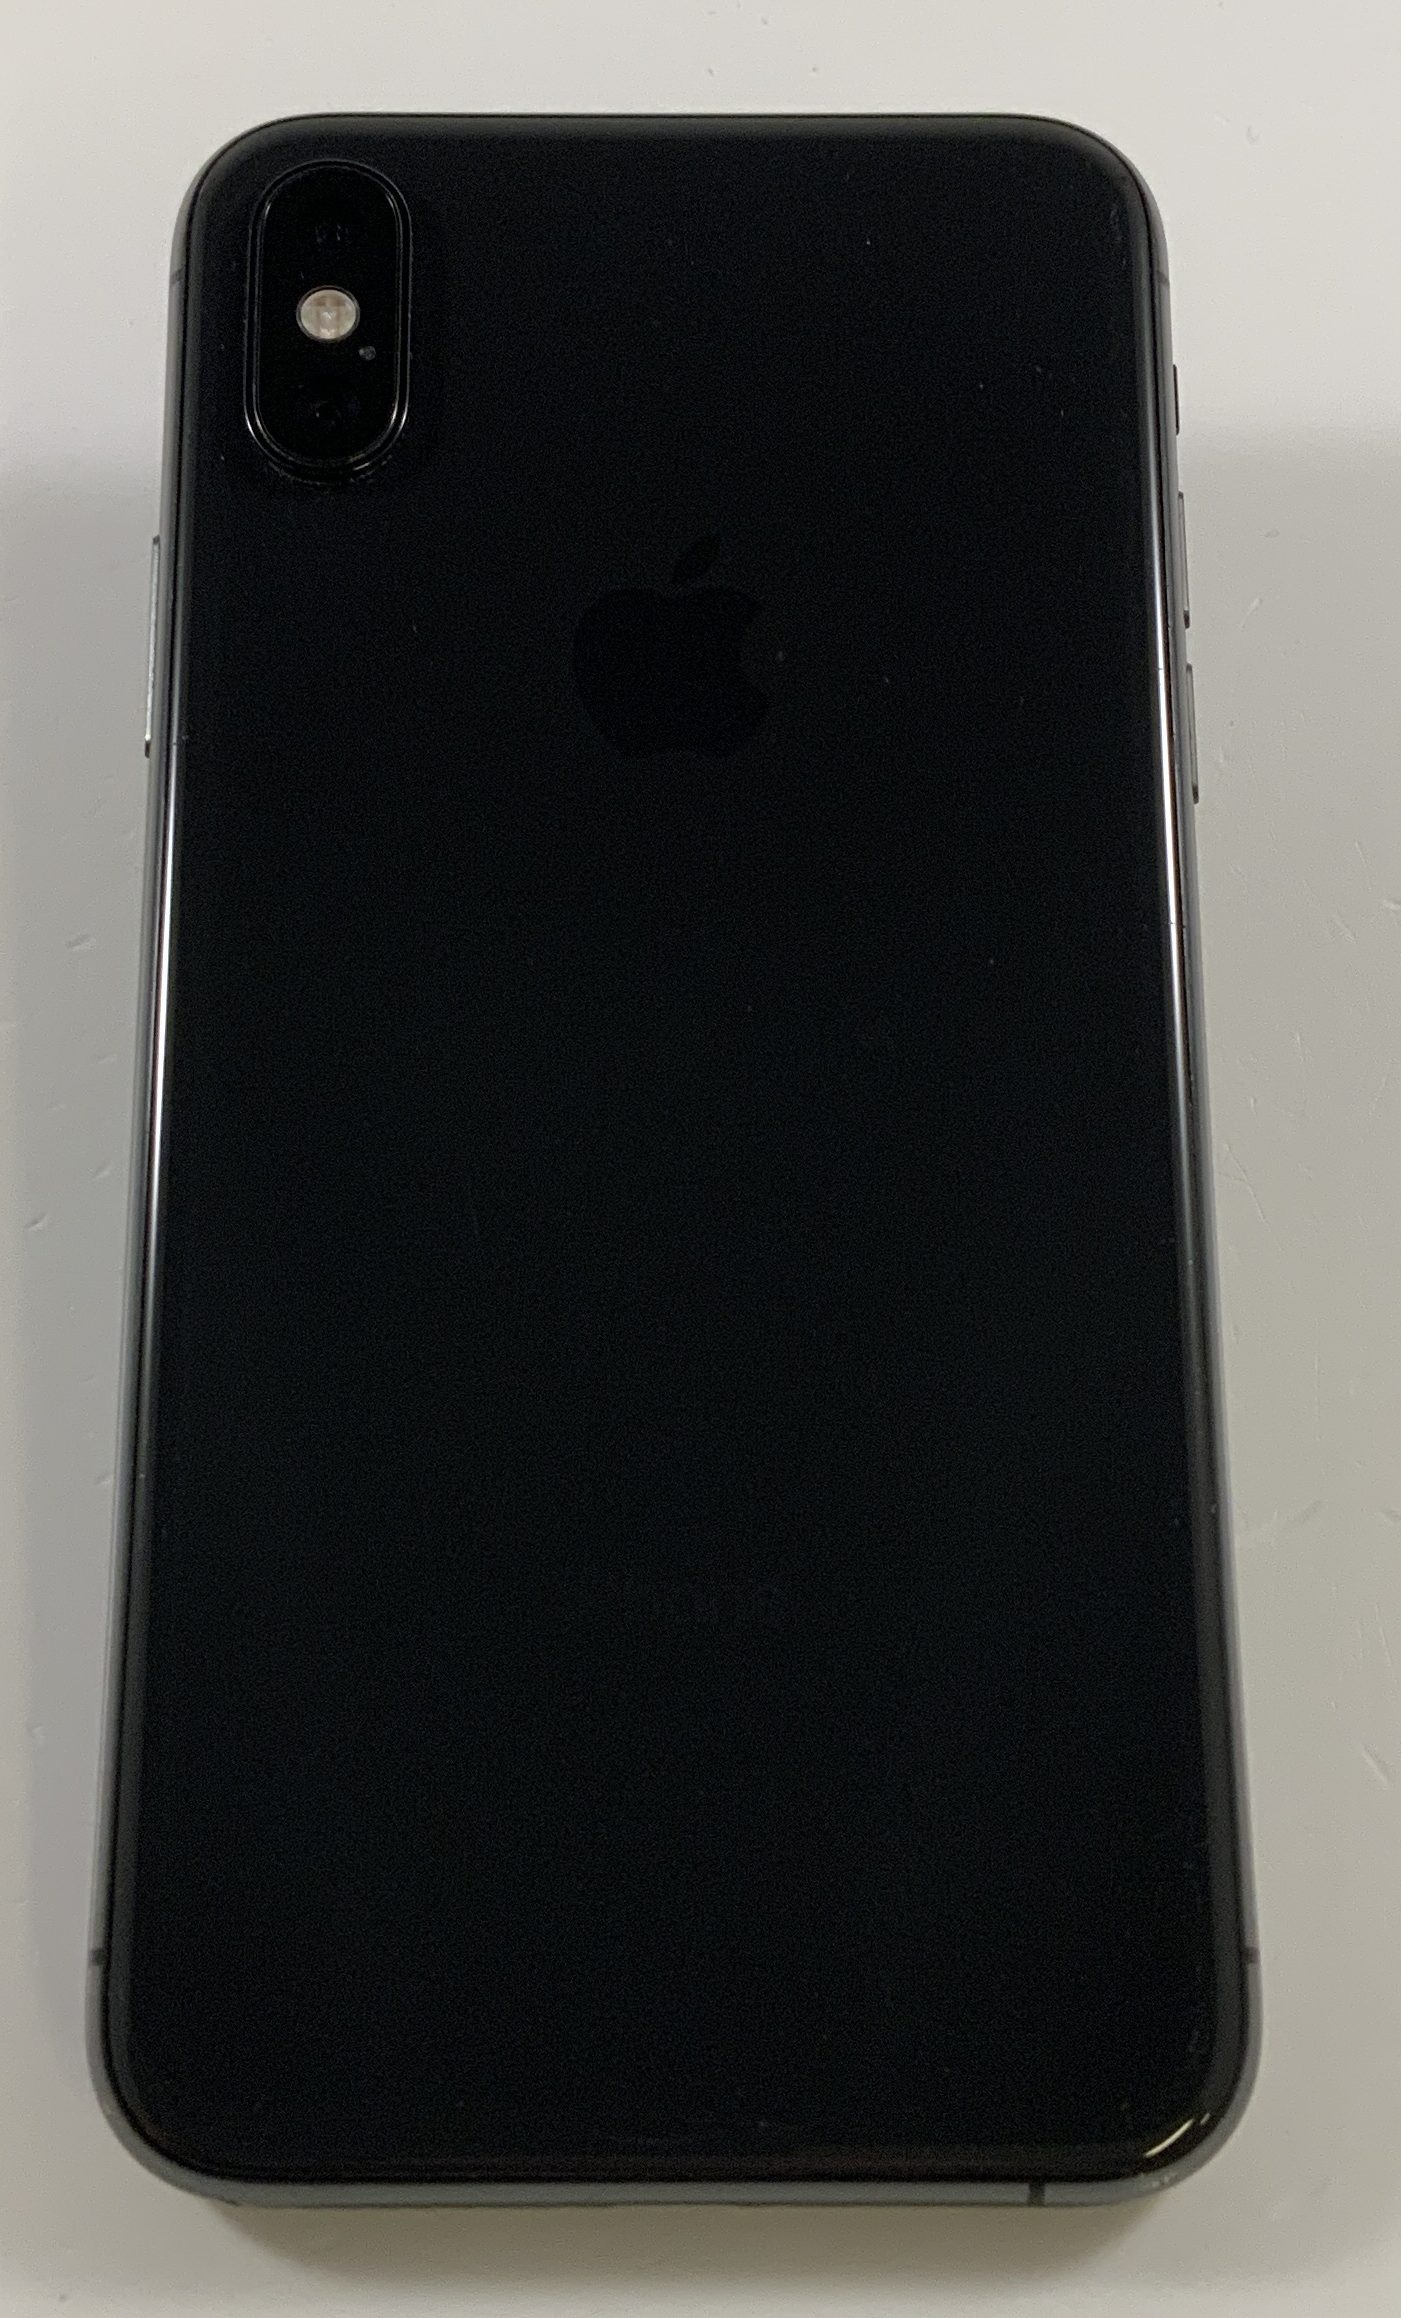 iPhone XS 256GB, 256GB, Space Gray, obraz 2